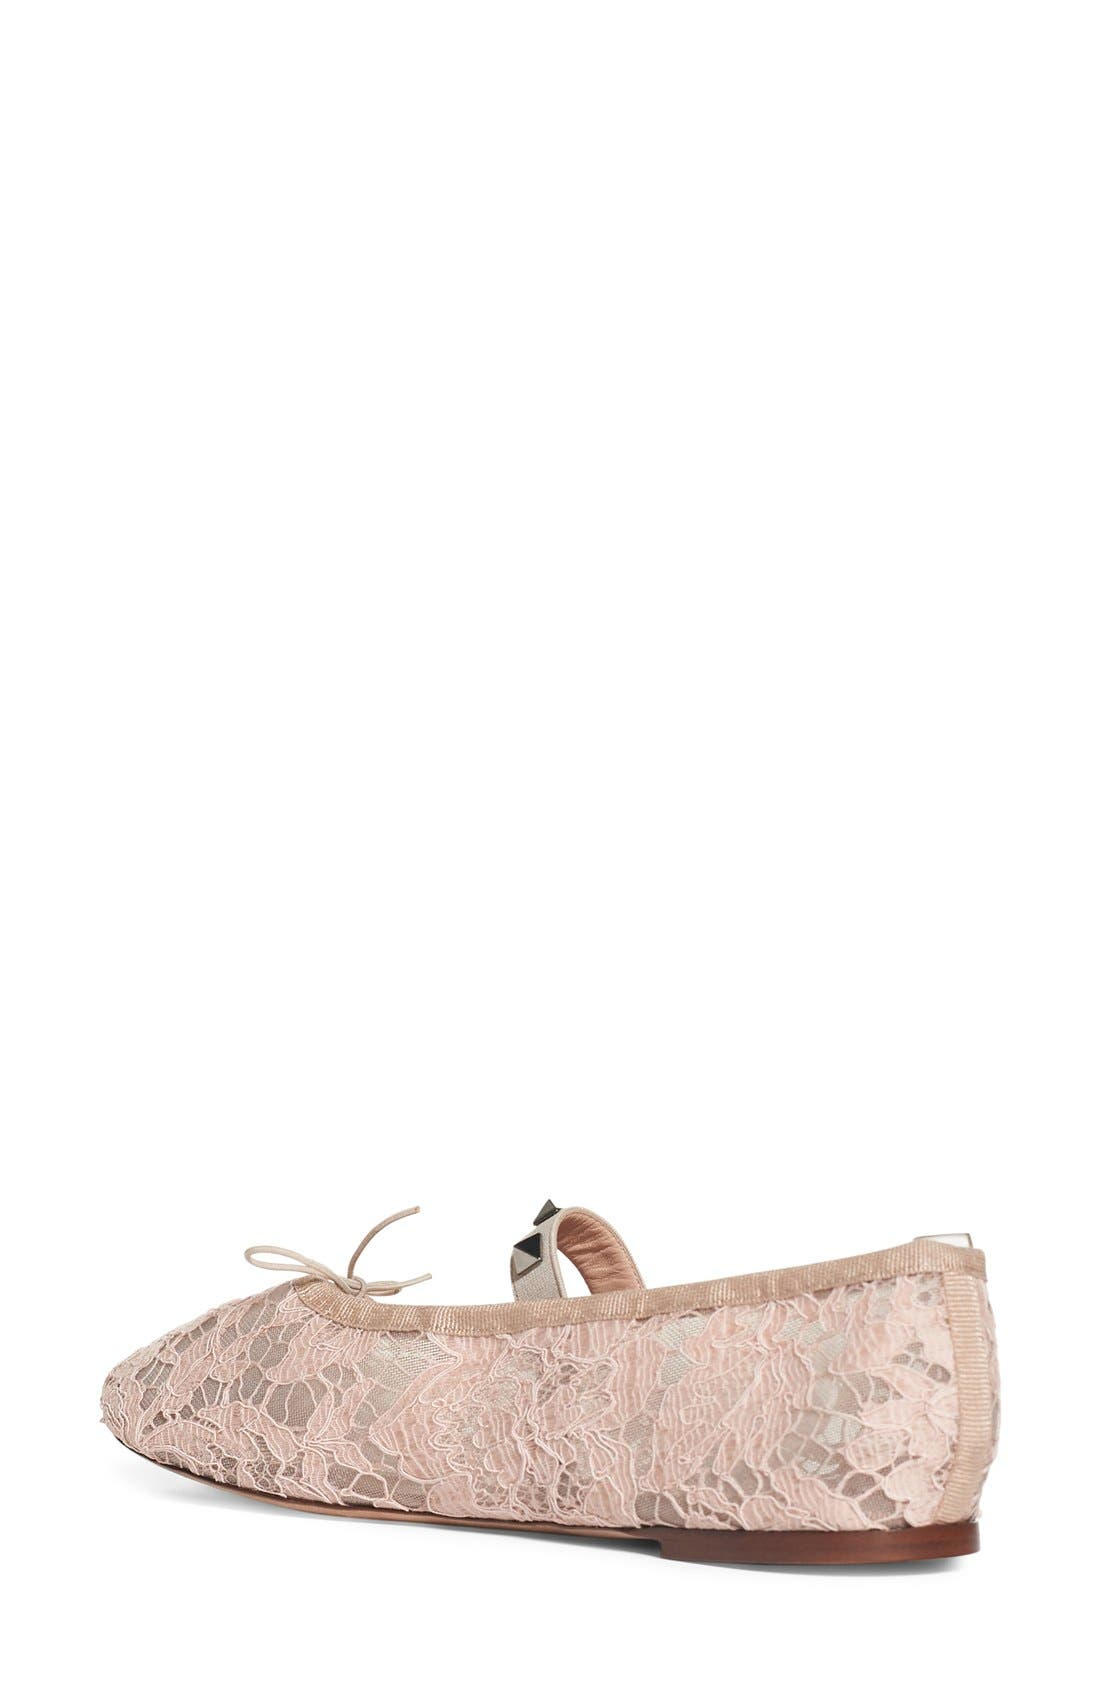 Alternate Image 3  - Valentino 'Rockstud' Lace Ballet Flat (Women)